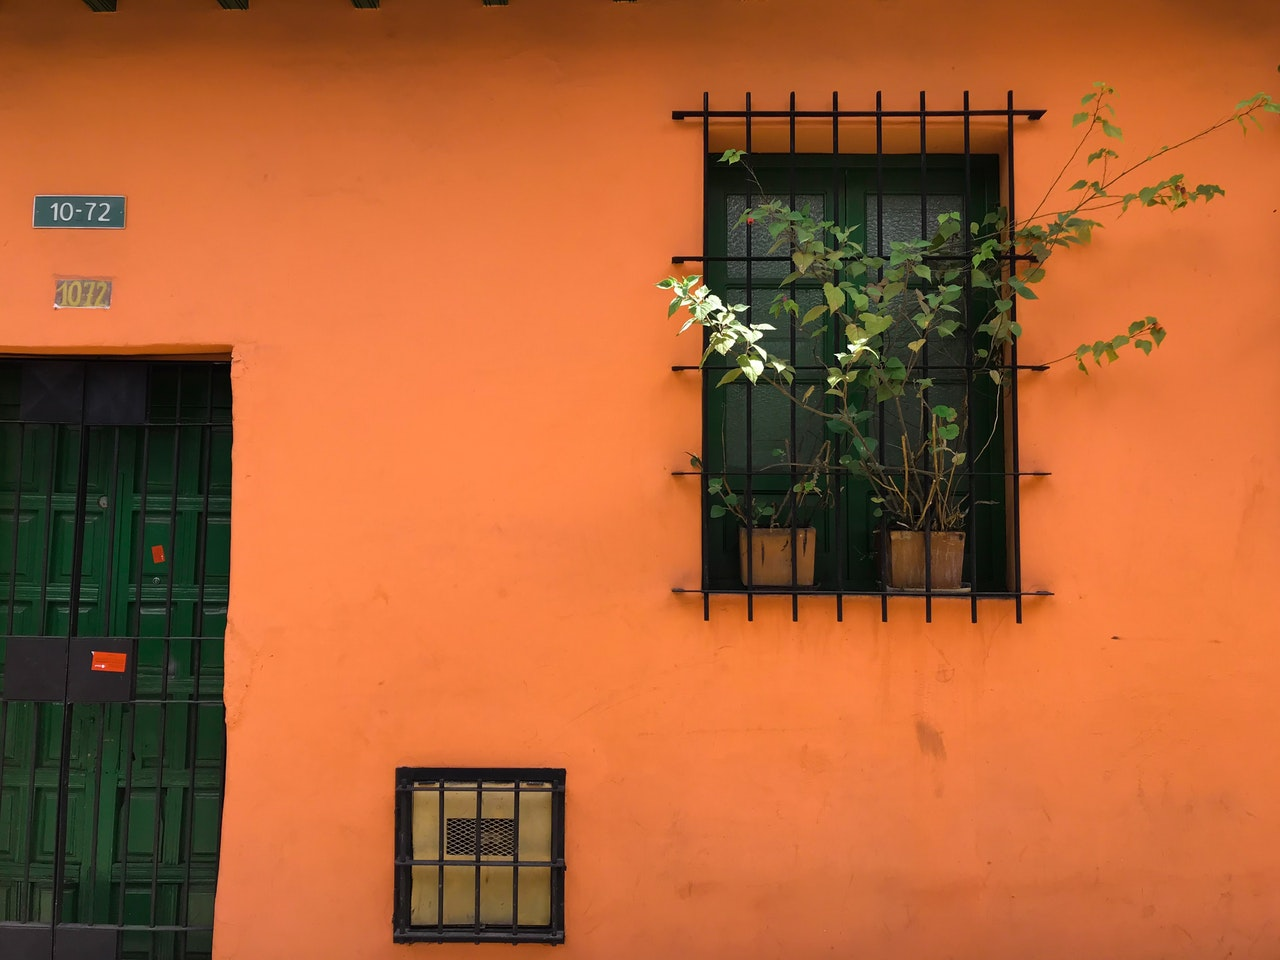 window with steel bars